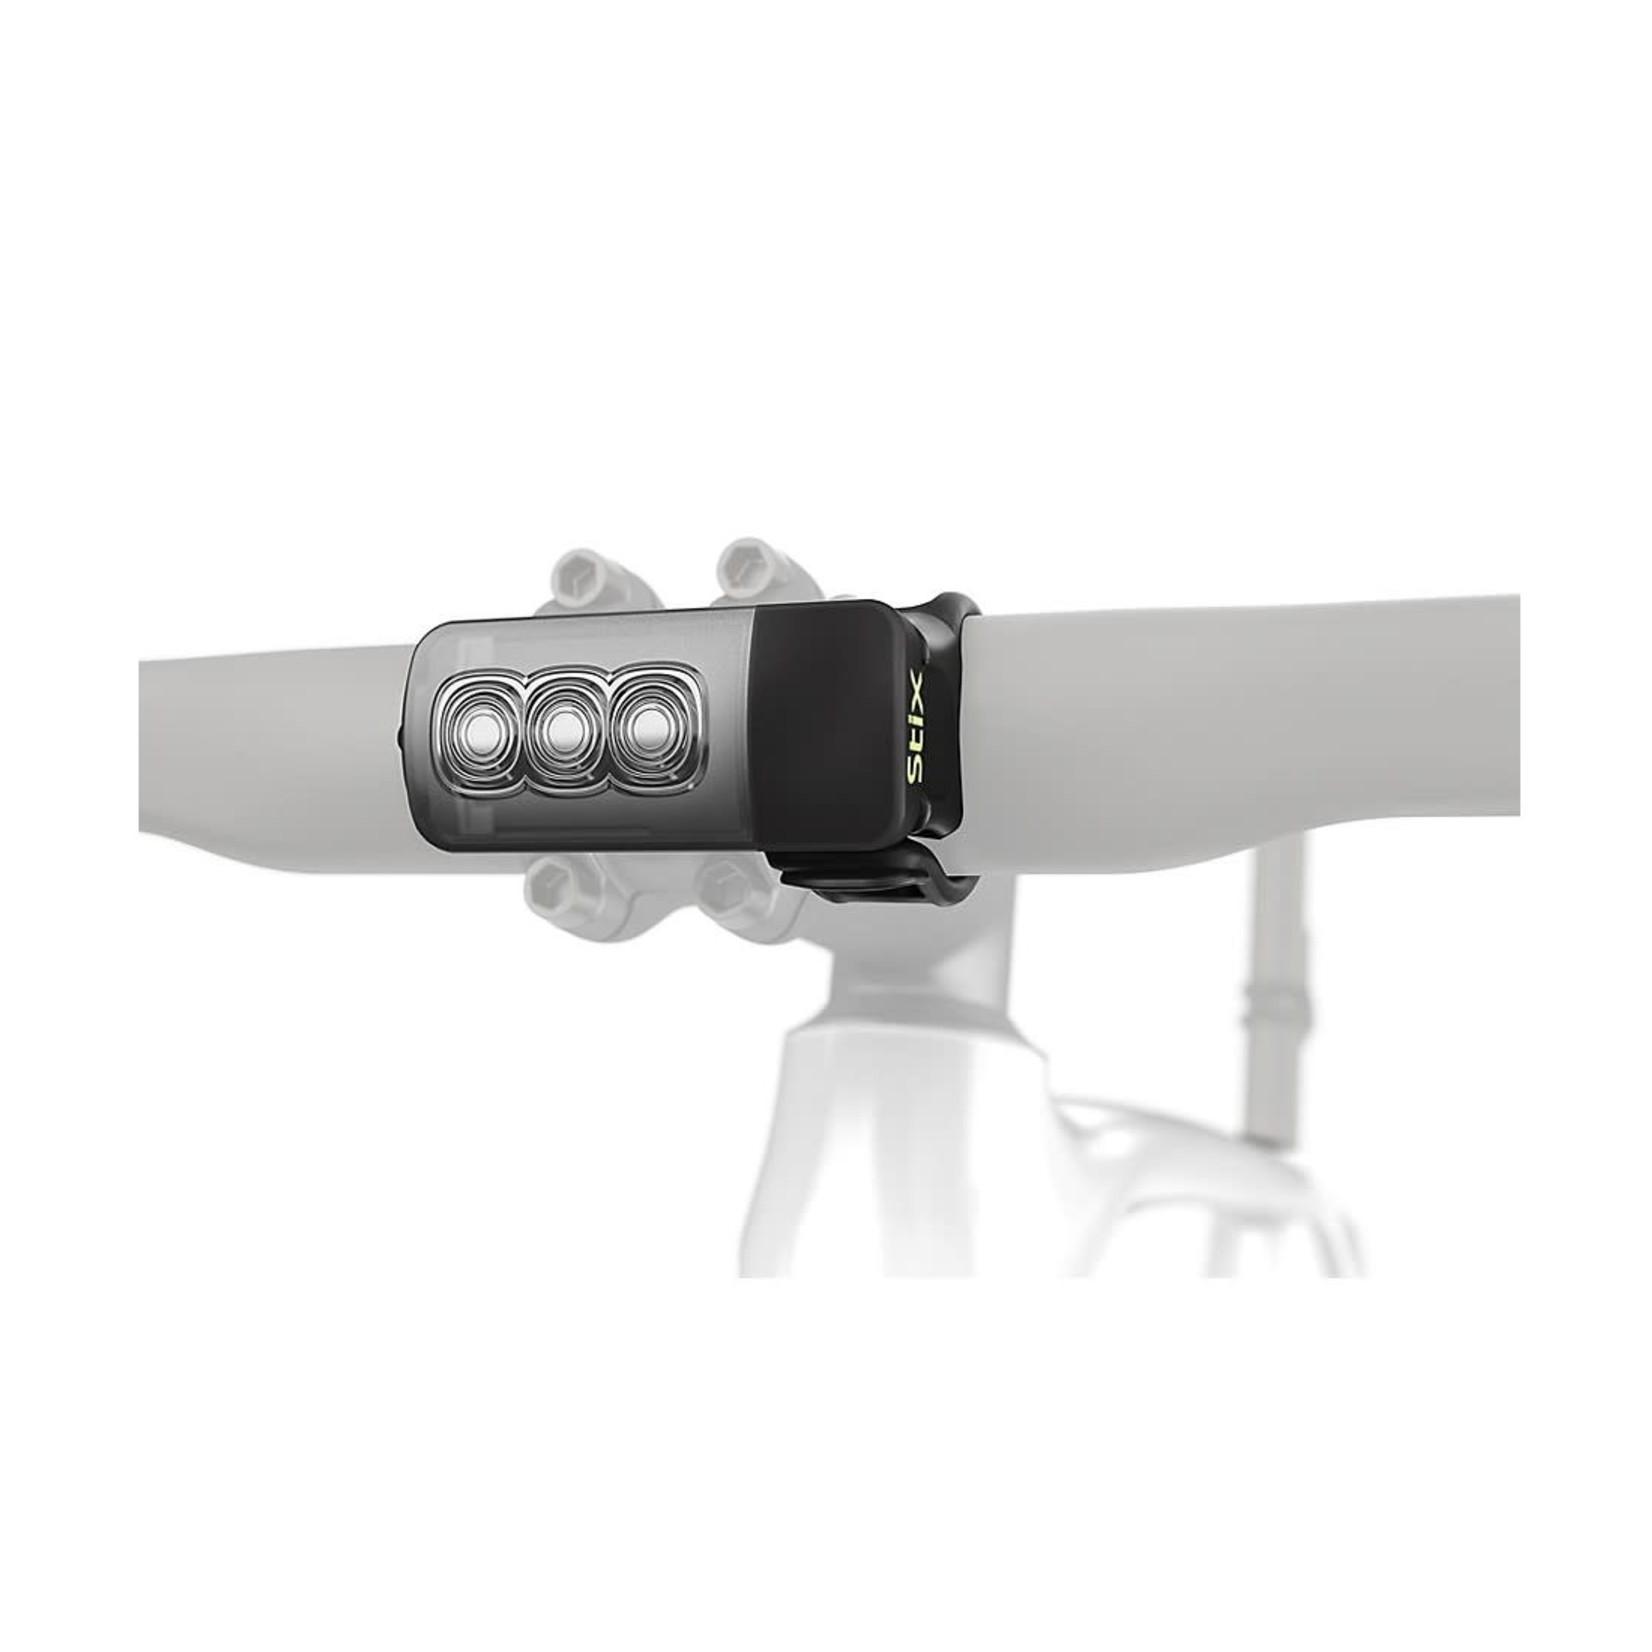 Specialized SPECIALIZED STIX SWITCH COMBO HEADLIGHT/TAILlGHT